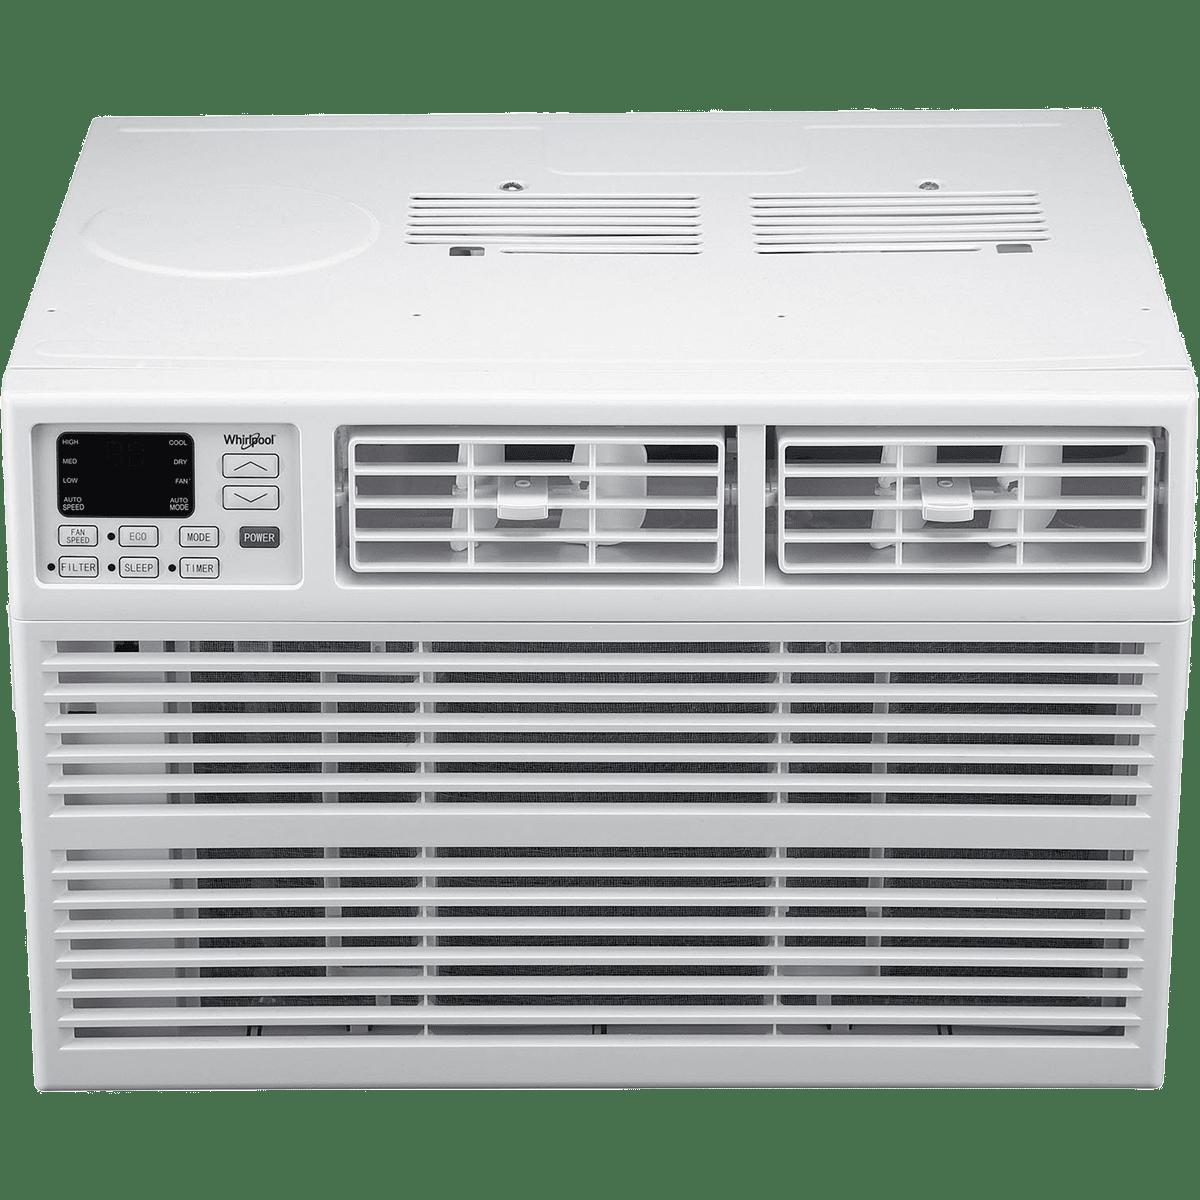 Whirlpool 15000 BTU Window Air Conditioner w| Electronic Controls (WHAW151BW)